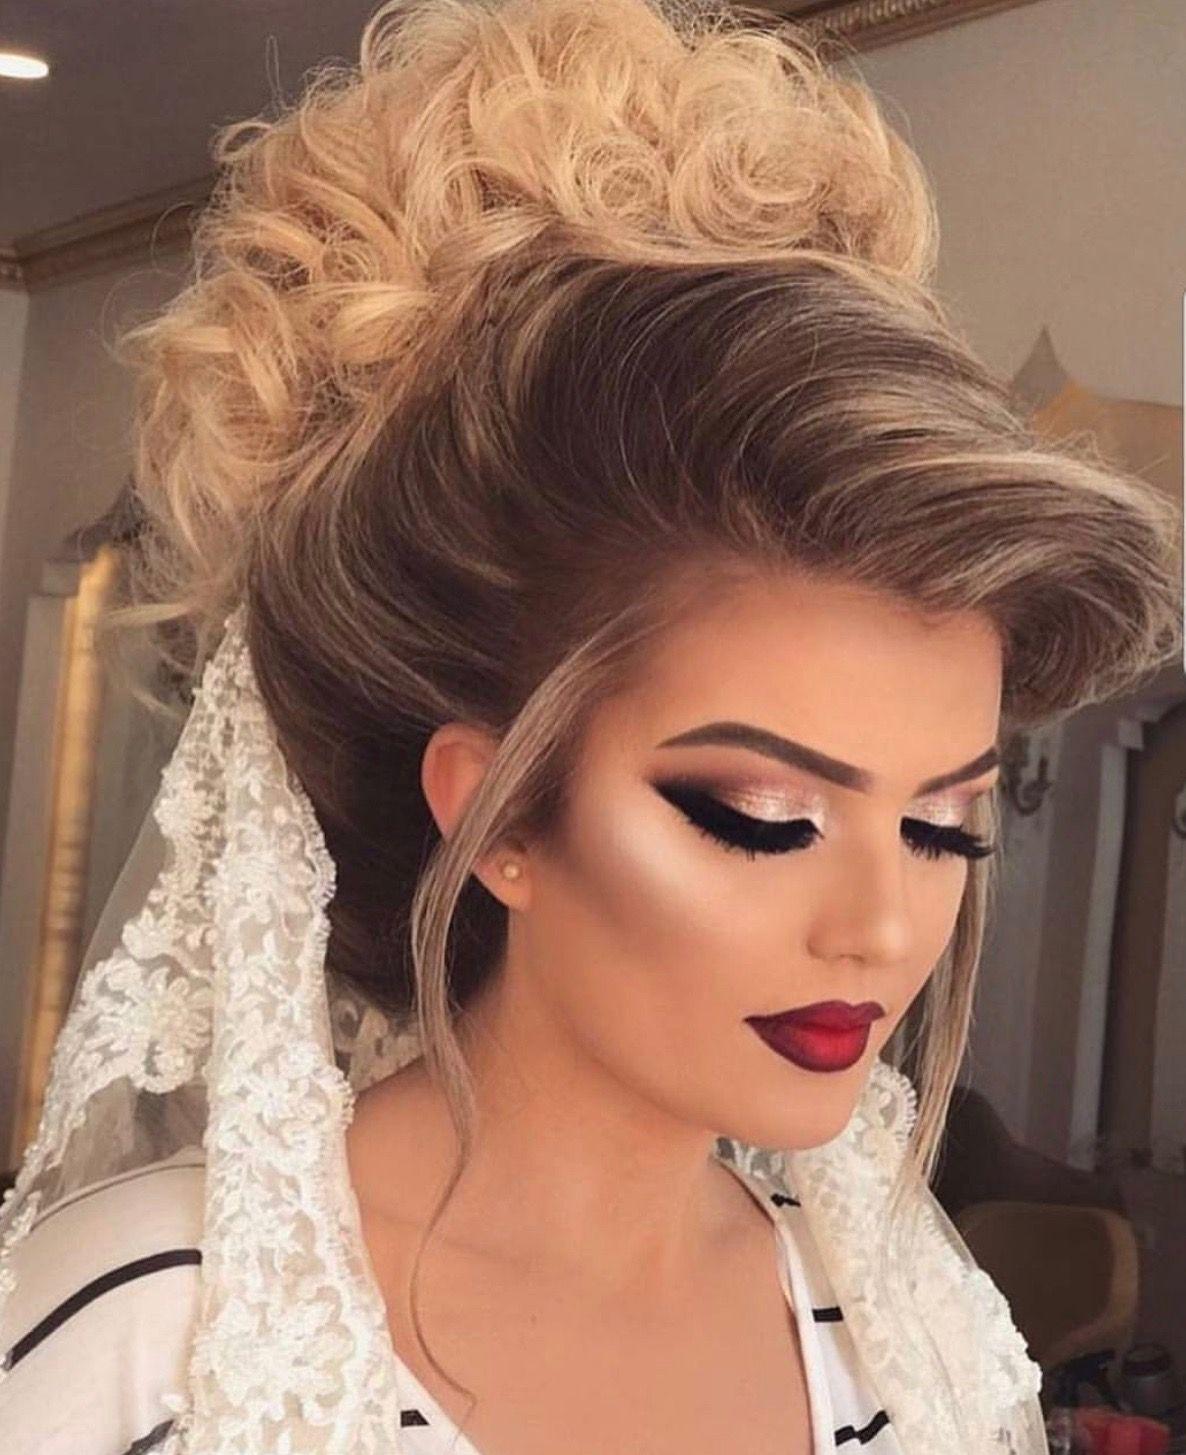 Pin By Nadine Elnatshe On Beauty Wedding Hair And Makeup Bride Makeup Bridal Makeup Looks